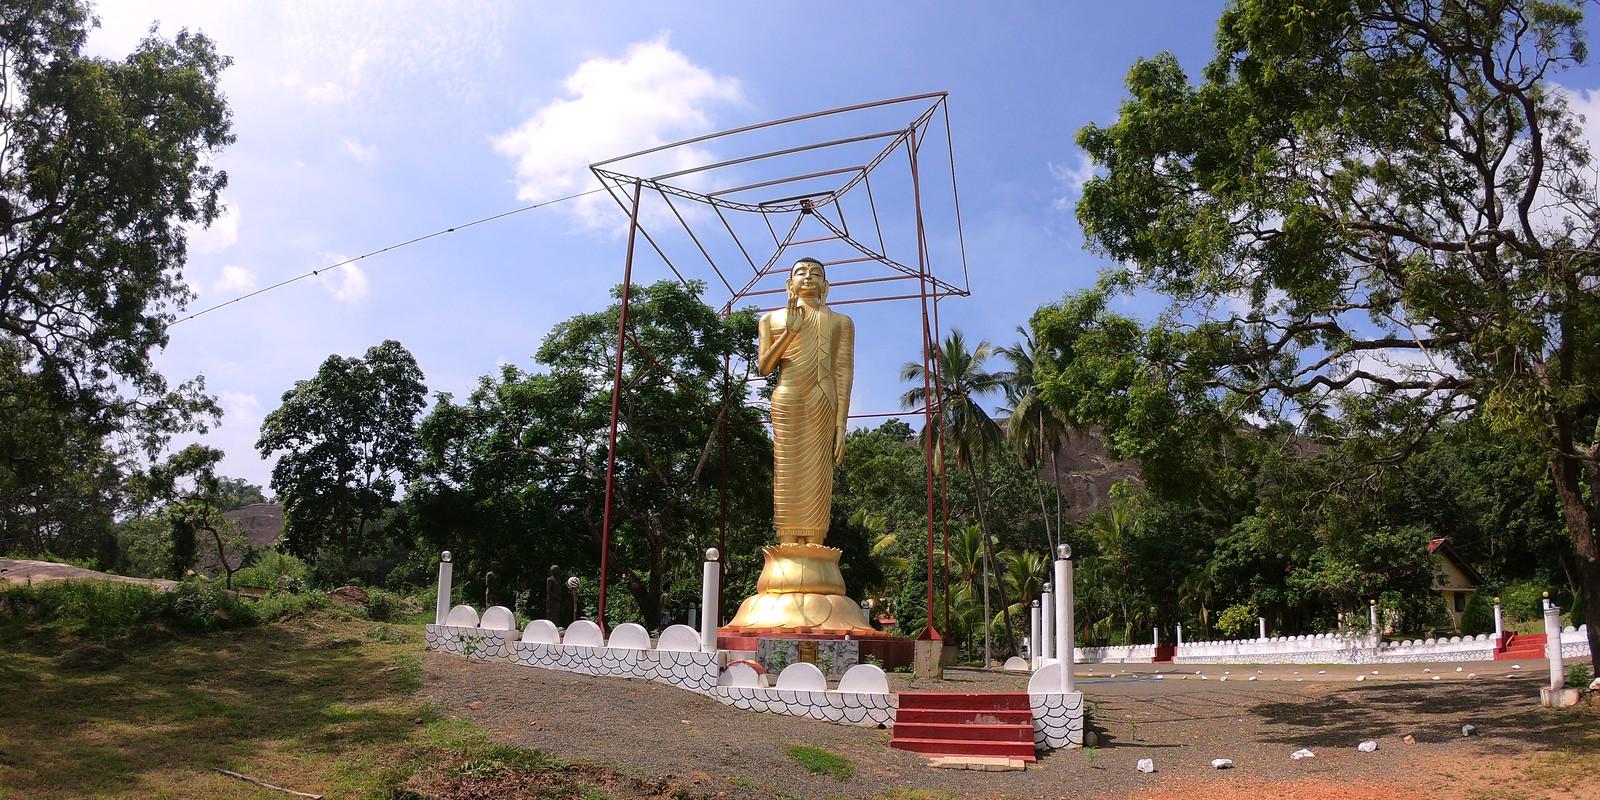 Aukana, la estatua de Buda más alta de Sri Lanka buda de aukana - 46781557831 0fcf8a1b09 h - Buda de Aukana, la estatua de Buda más alta de Sri Lanka